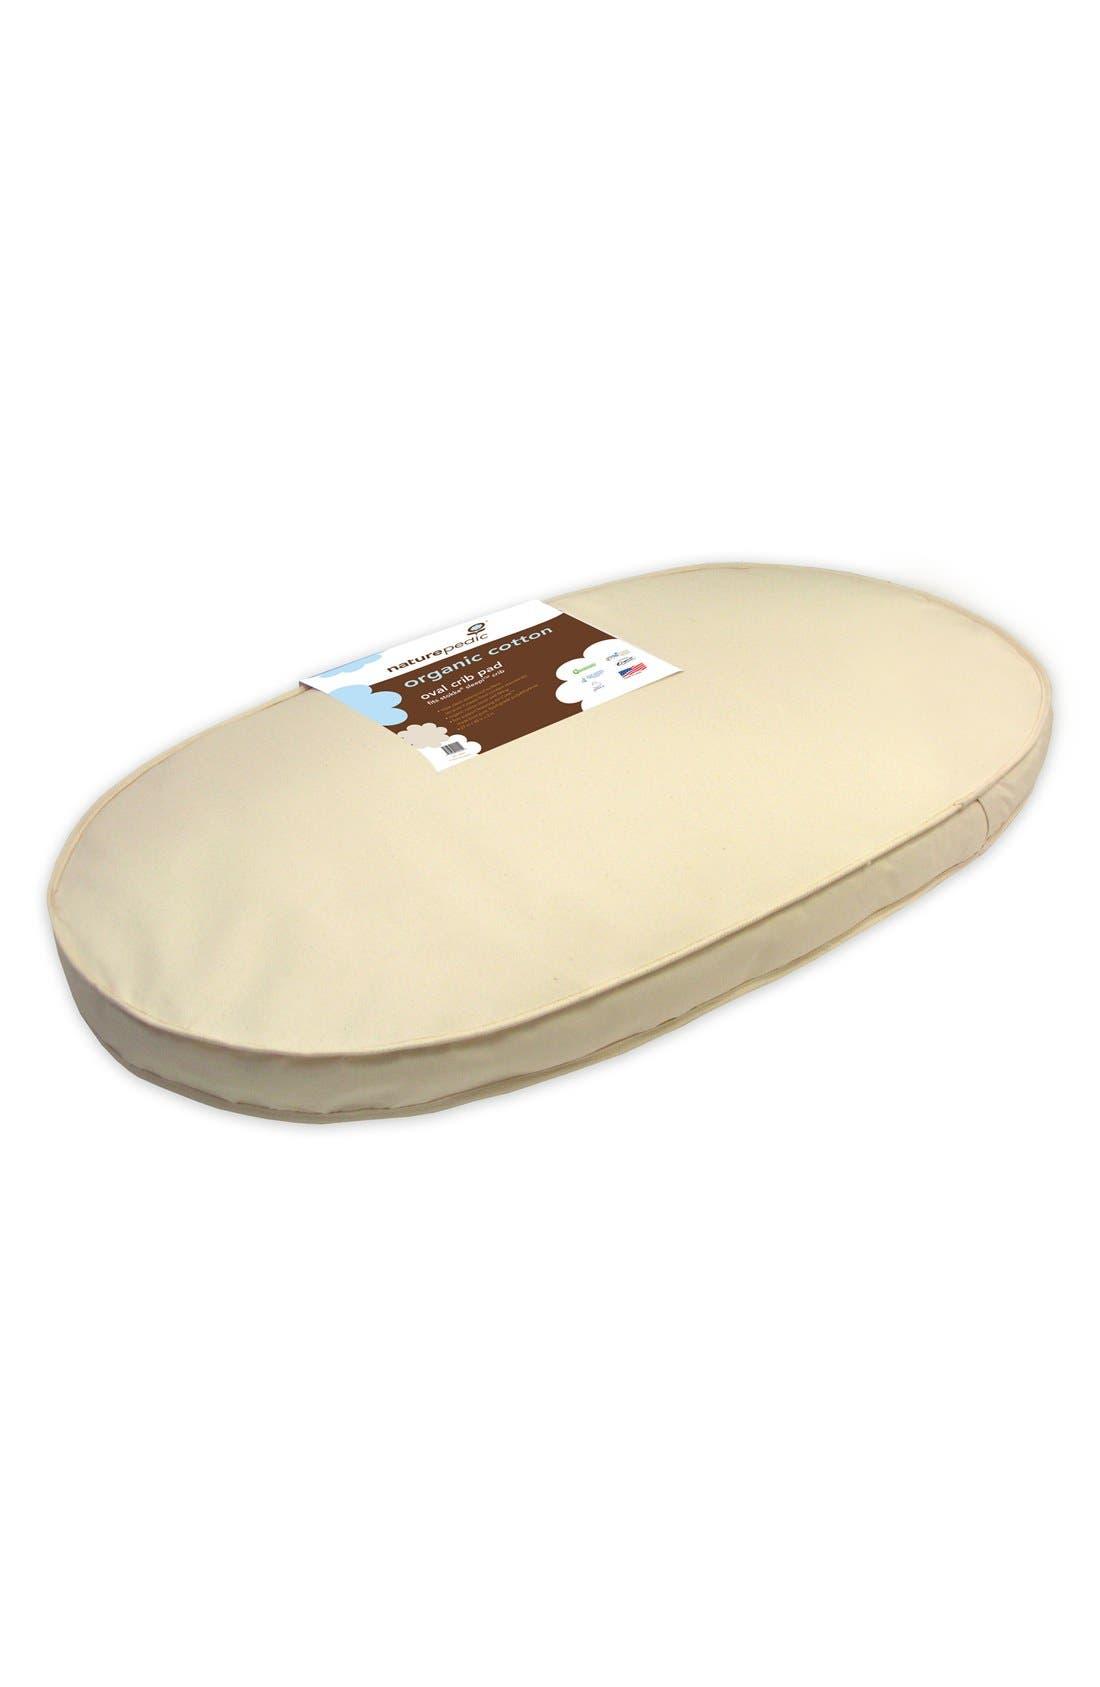 Organic Cotton Oval Crib Mattress for Stokke Sleepi Crib,                         Main,                         color, NATURAL